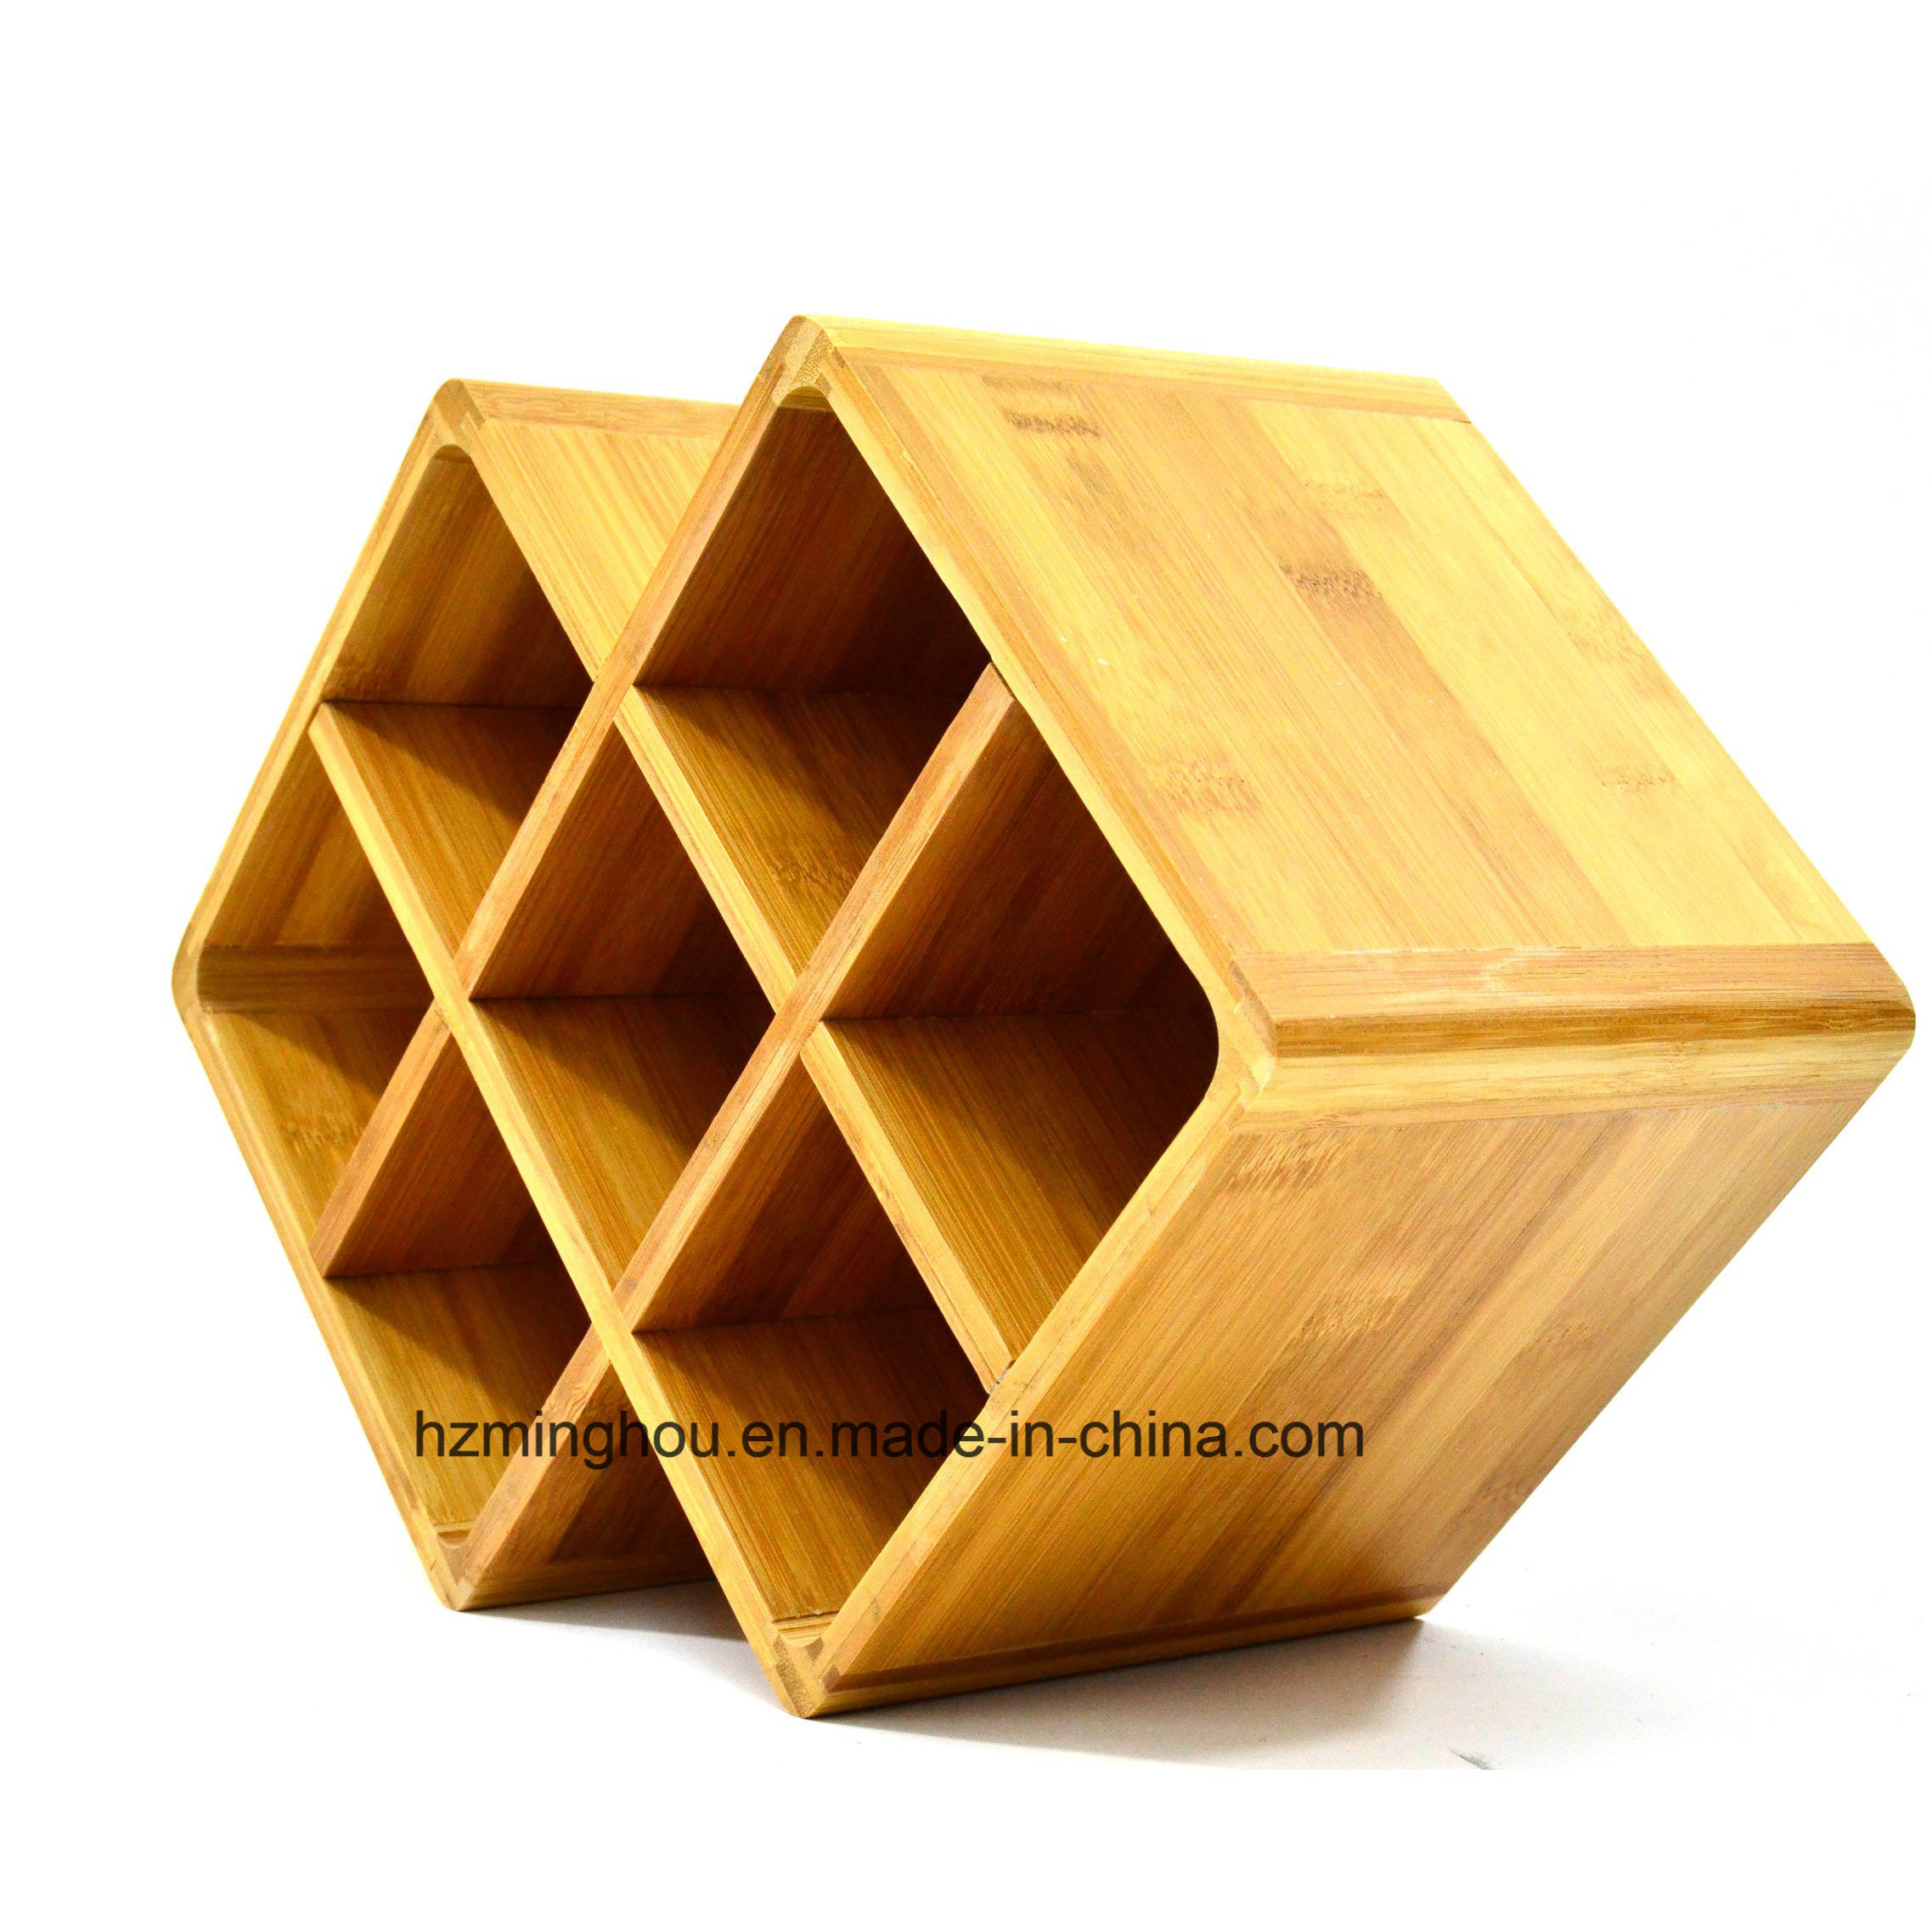 Widsom Bamboo Wine Rack 8 Bottles for Home Storage Shelf